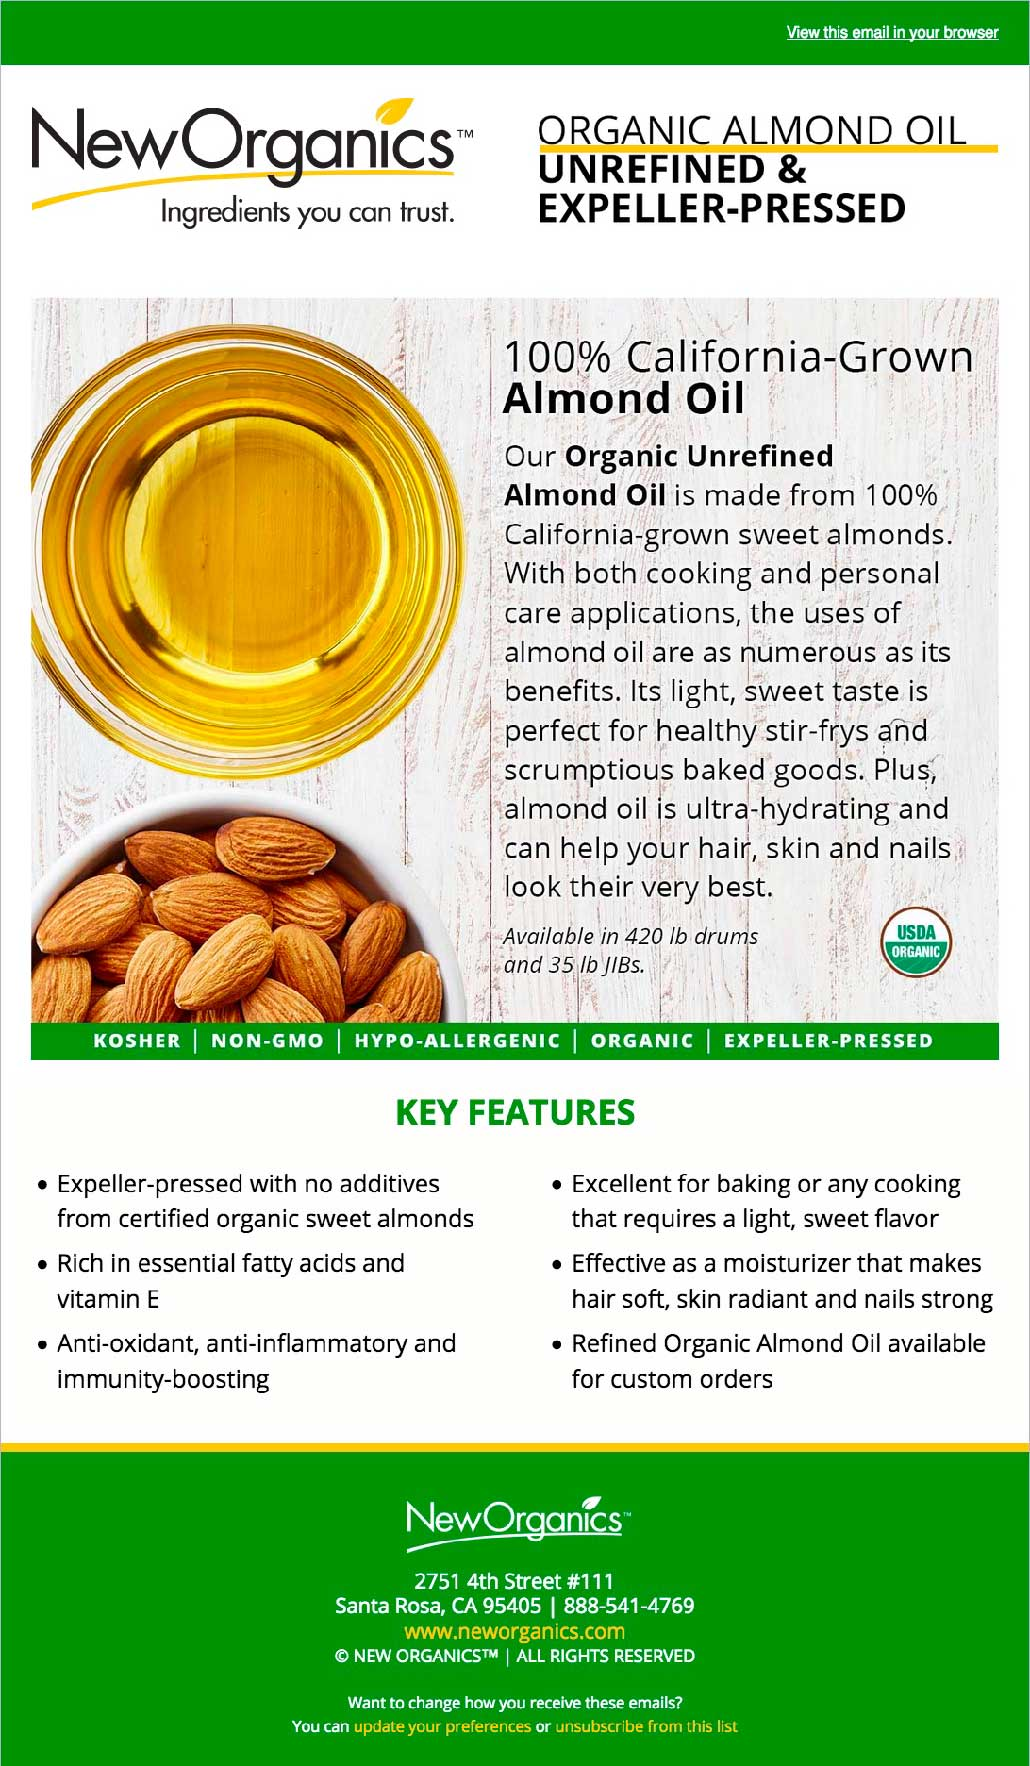 New Organics Organic Almond Oil Email